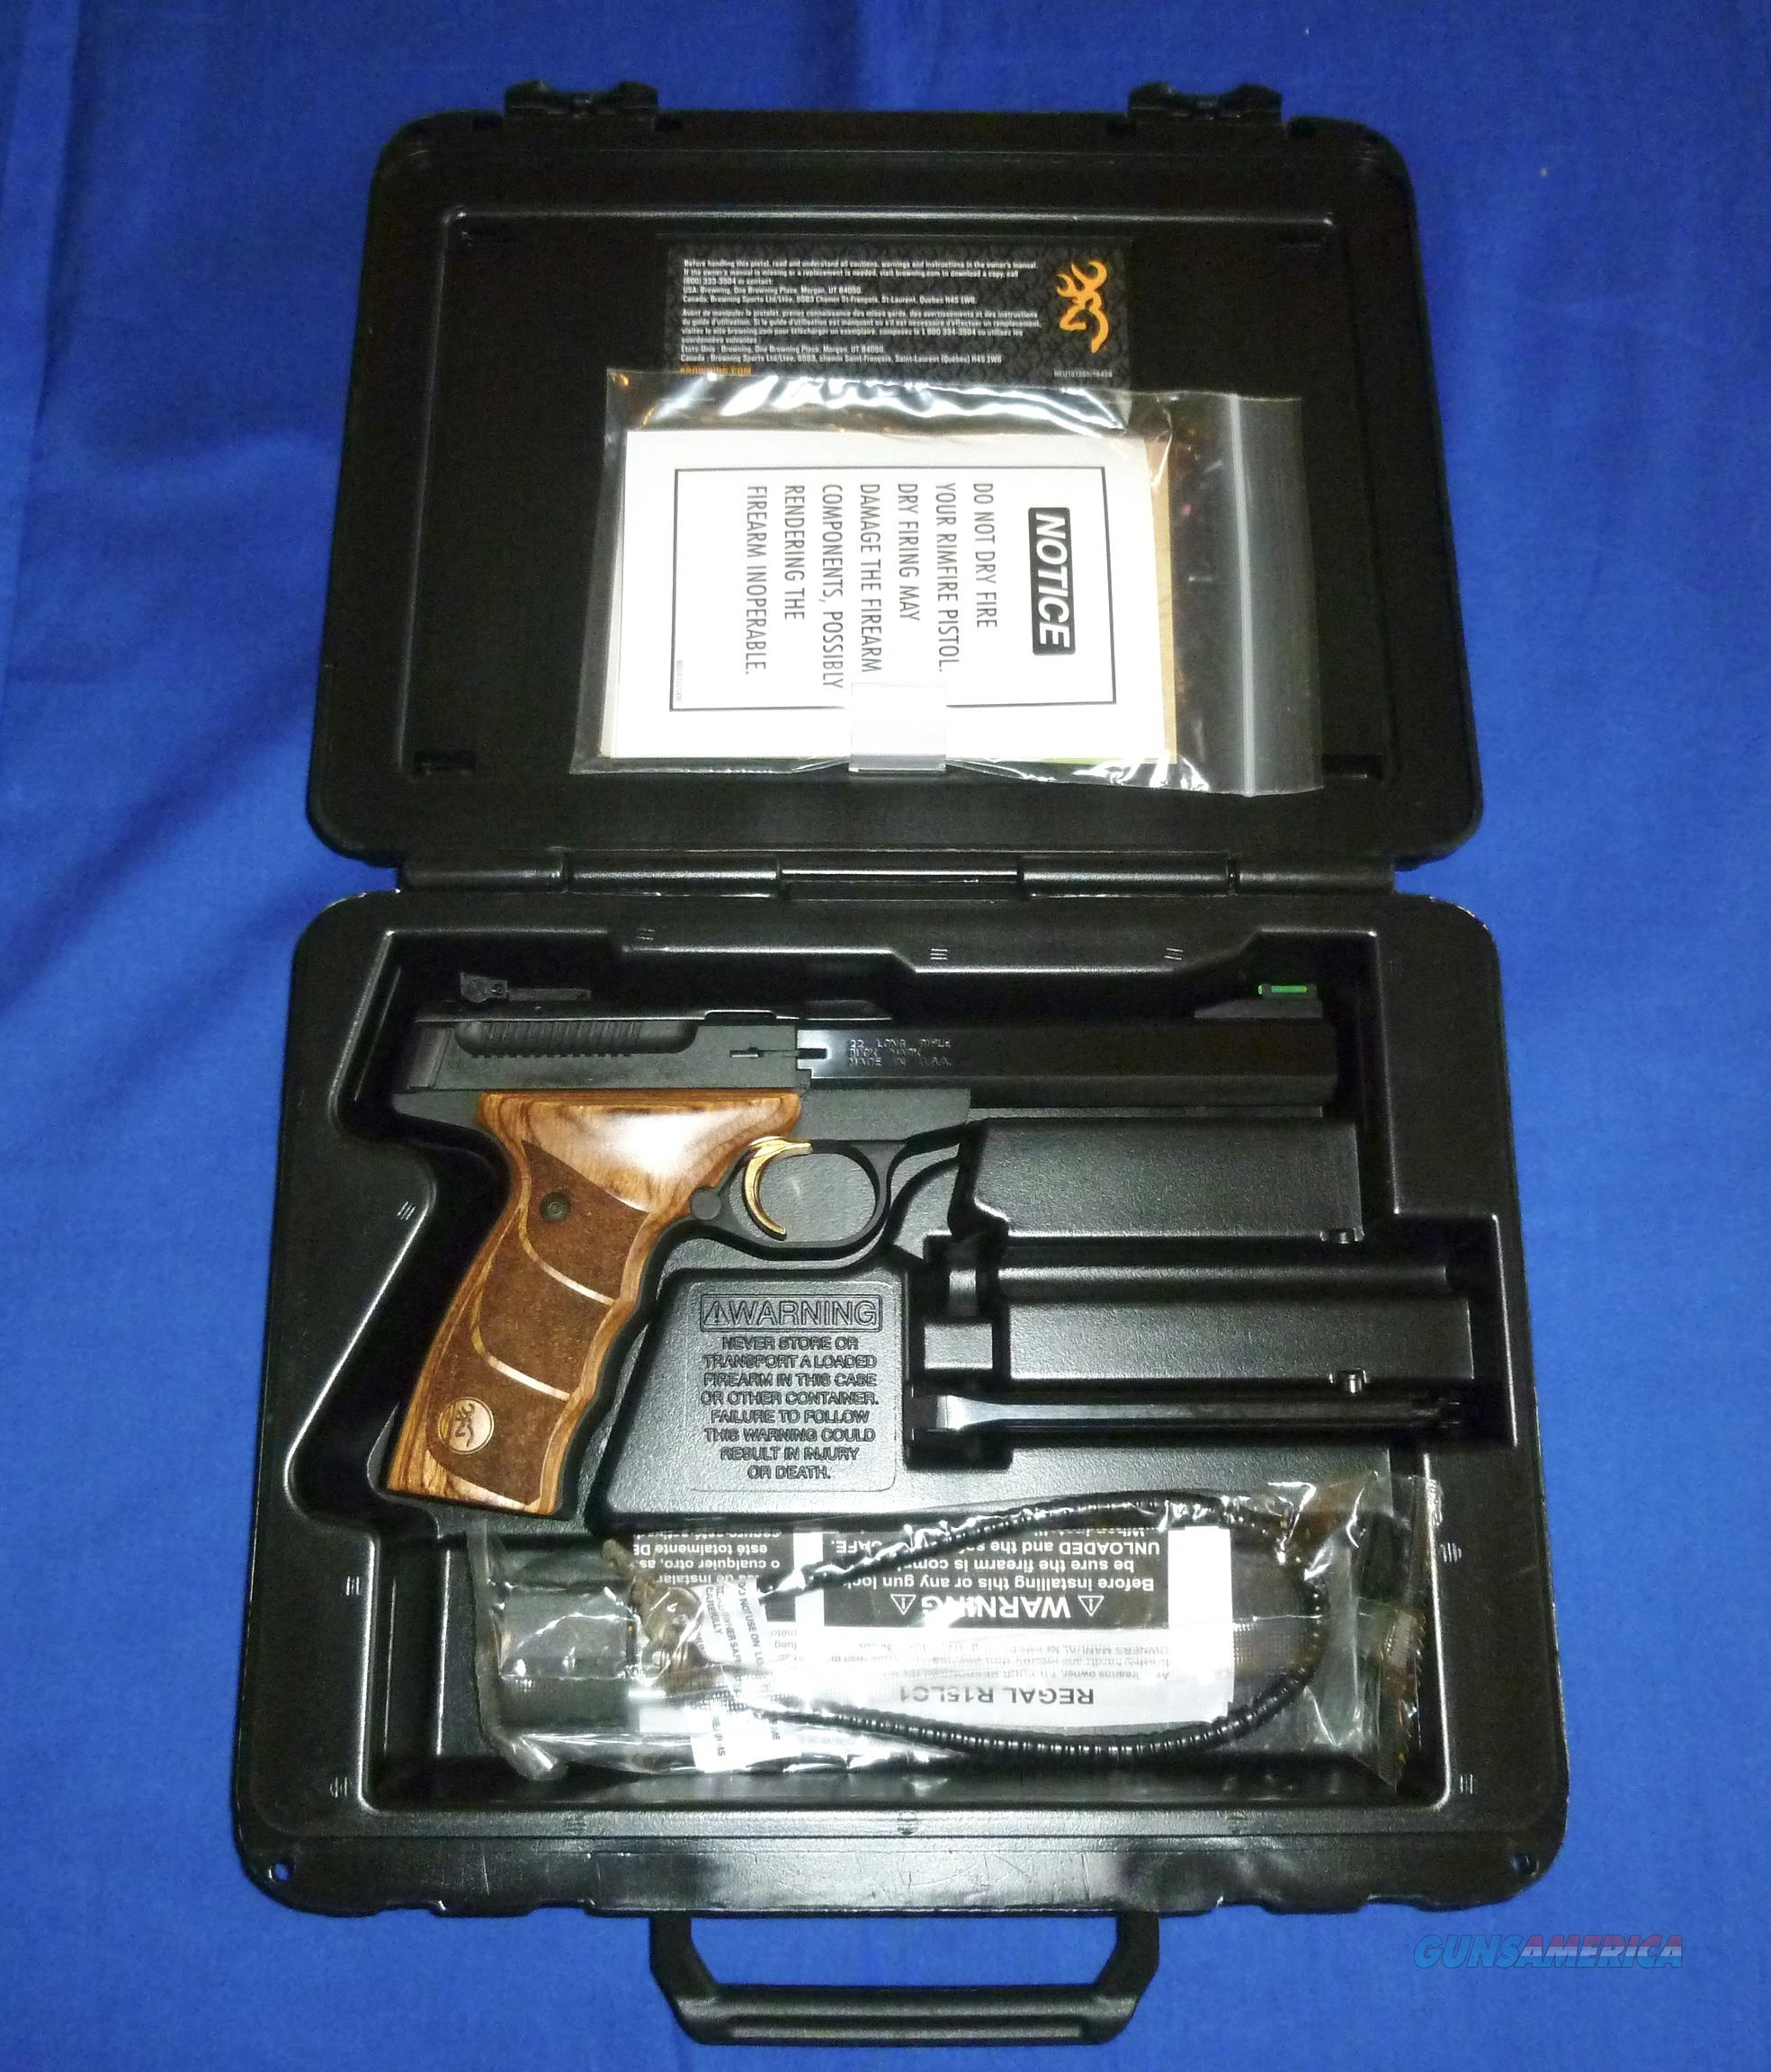 BROWNING BUCK MARK PLUS UDX 22LR PISTOL  Guns > Pistols > Browning Pistols > Buckmark